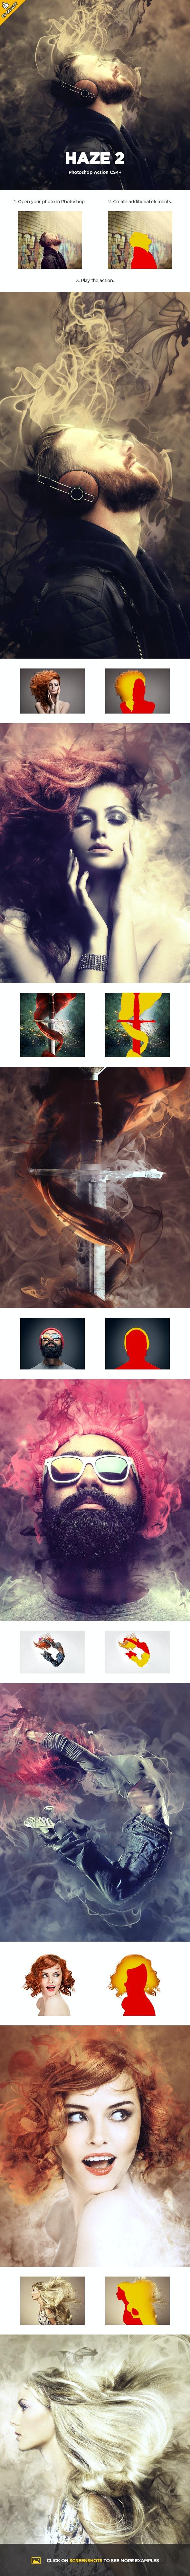 Haze 2 CS4+ Photoshop Action - Photo Effects Actions